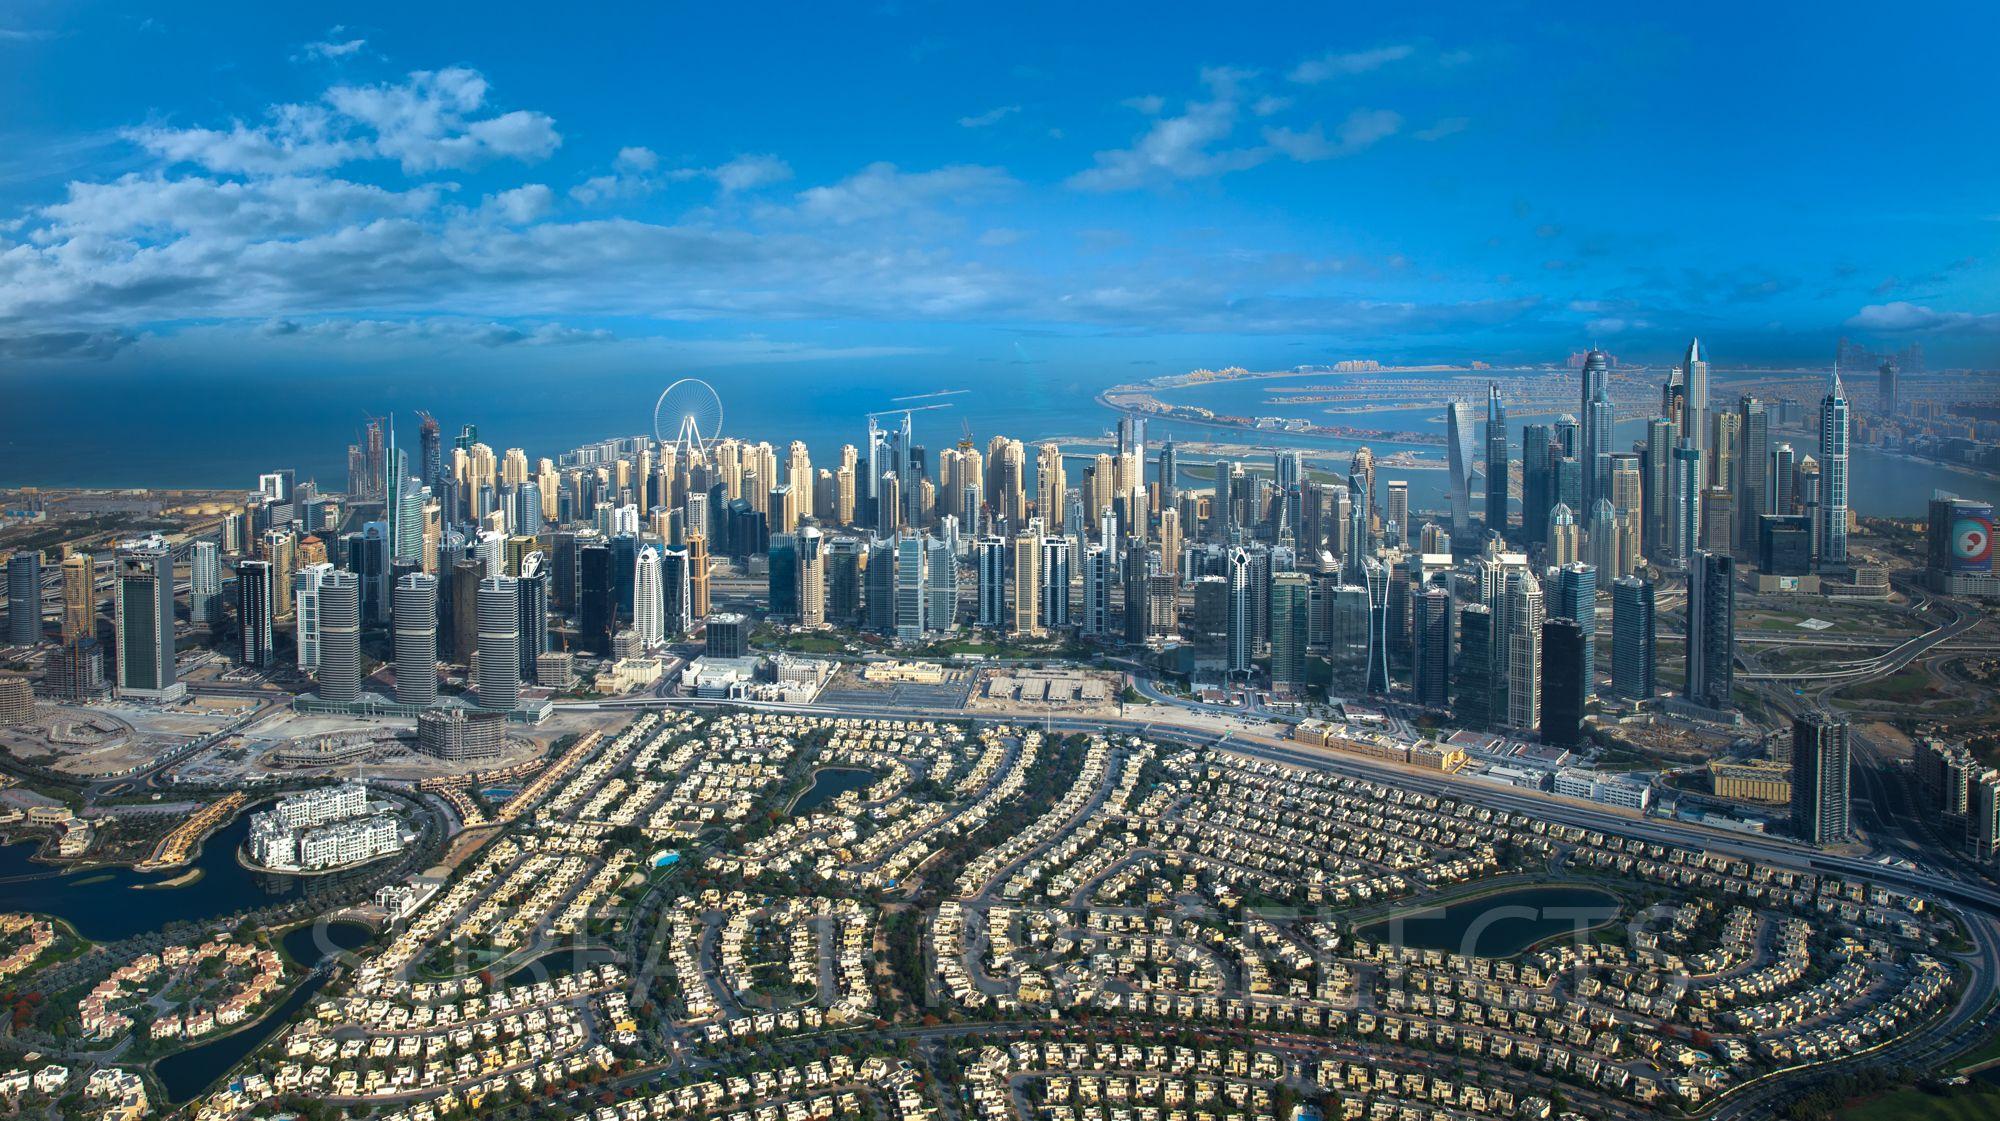 Dubai JLT and Marina Aerial Pano